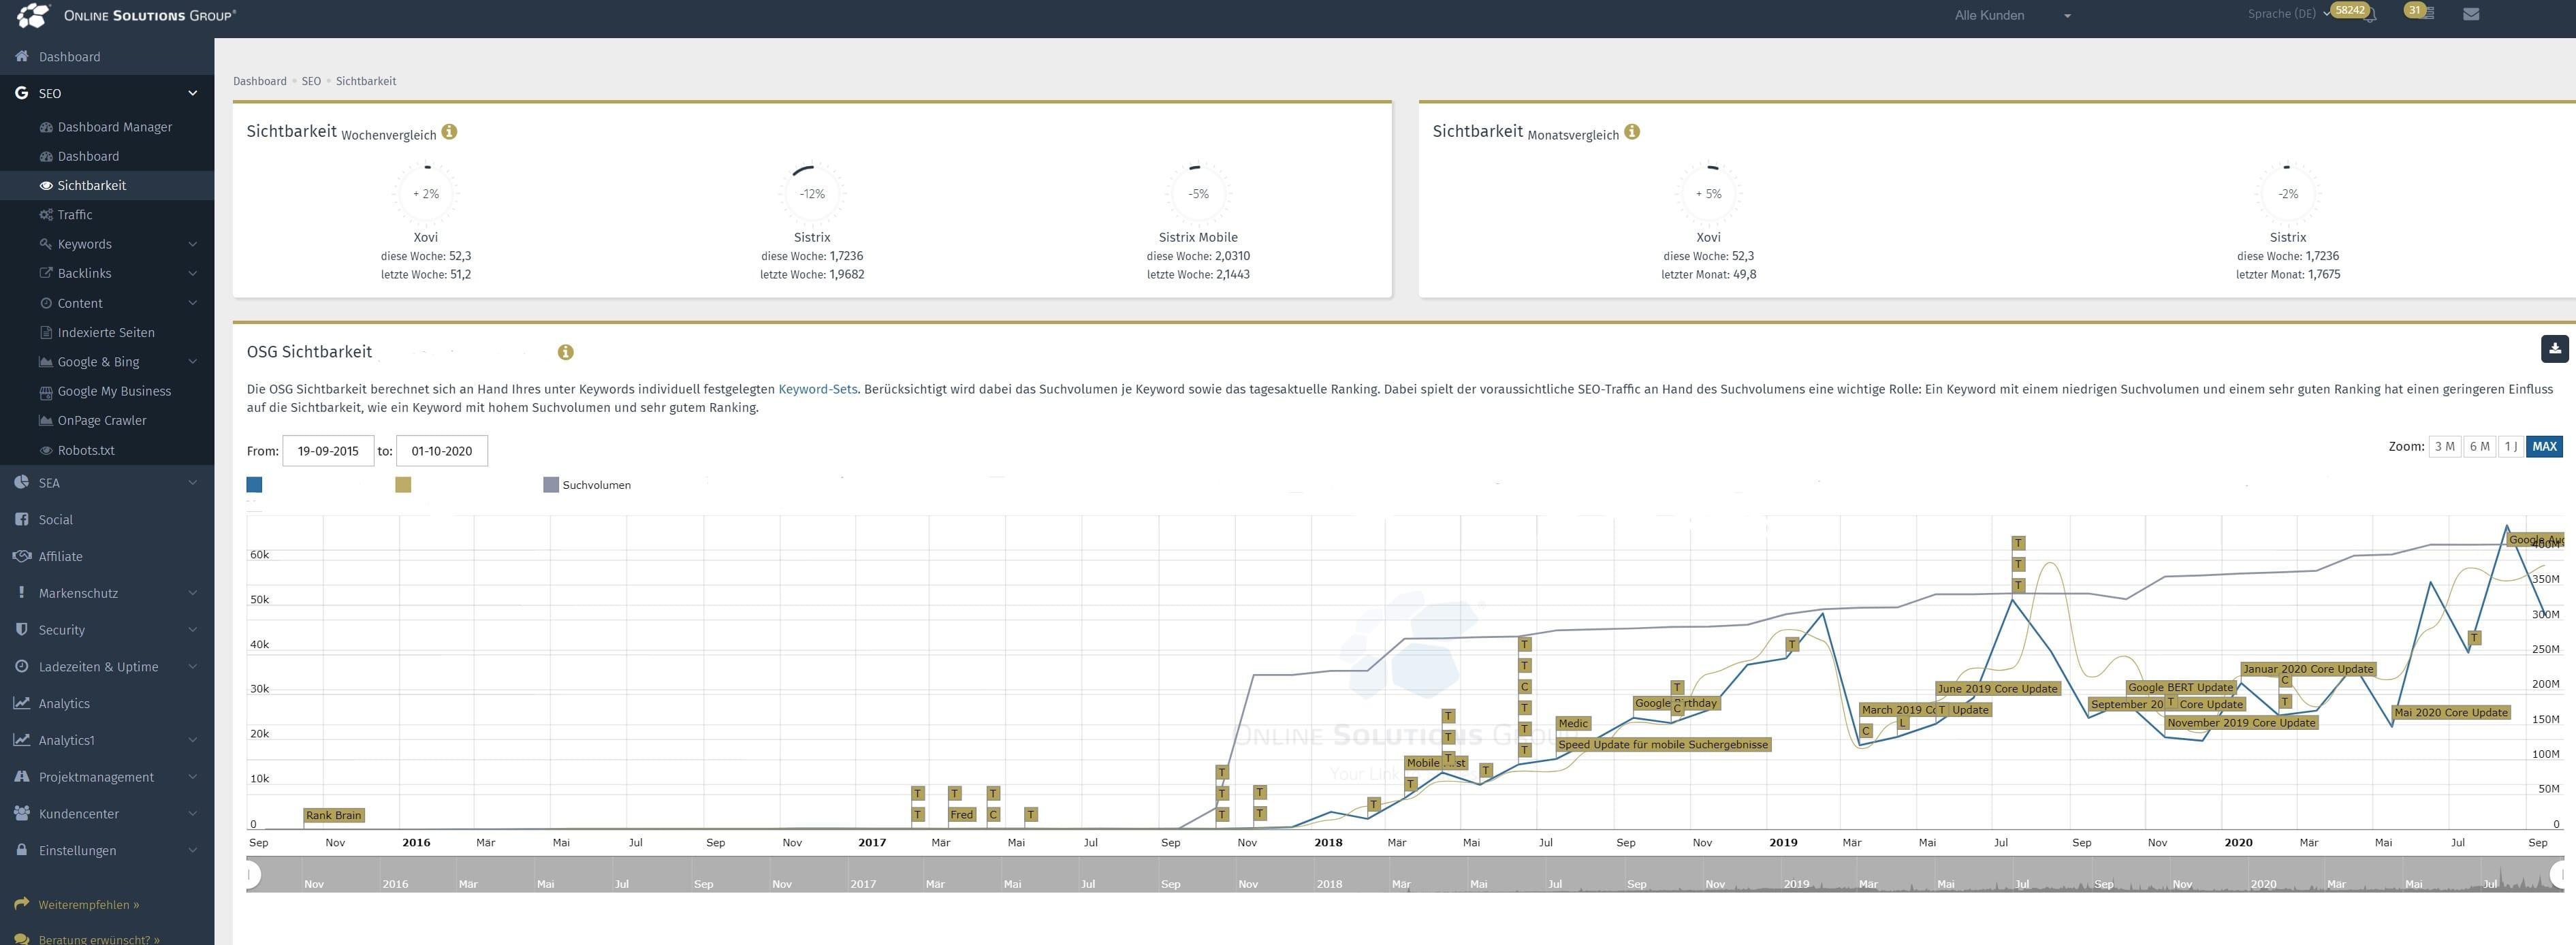 Sichtbarkeitsanalyse OSG